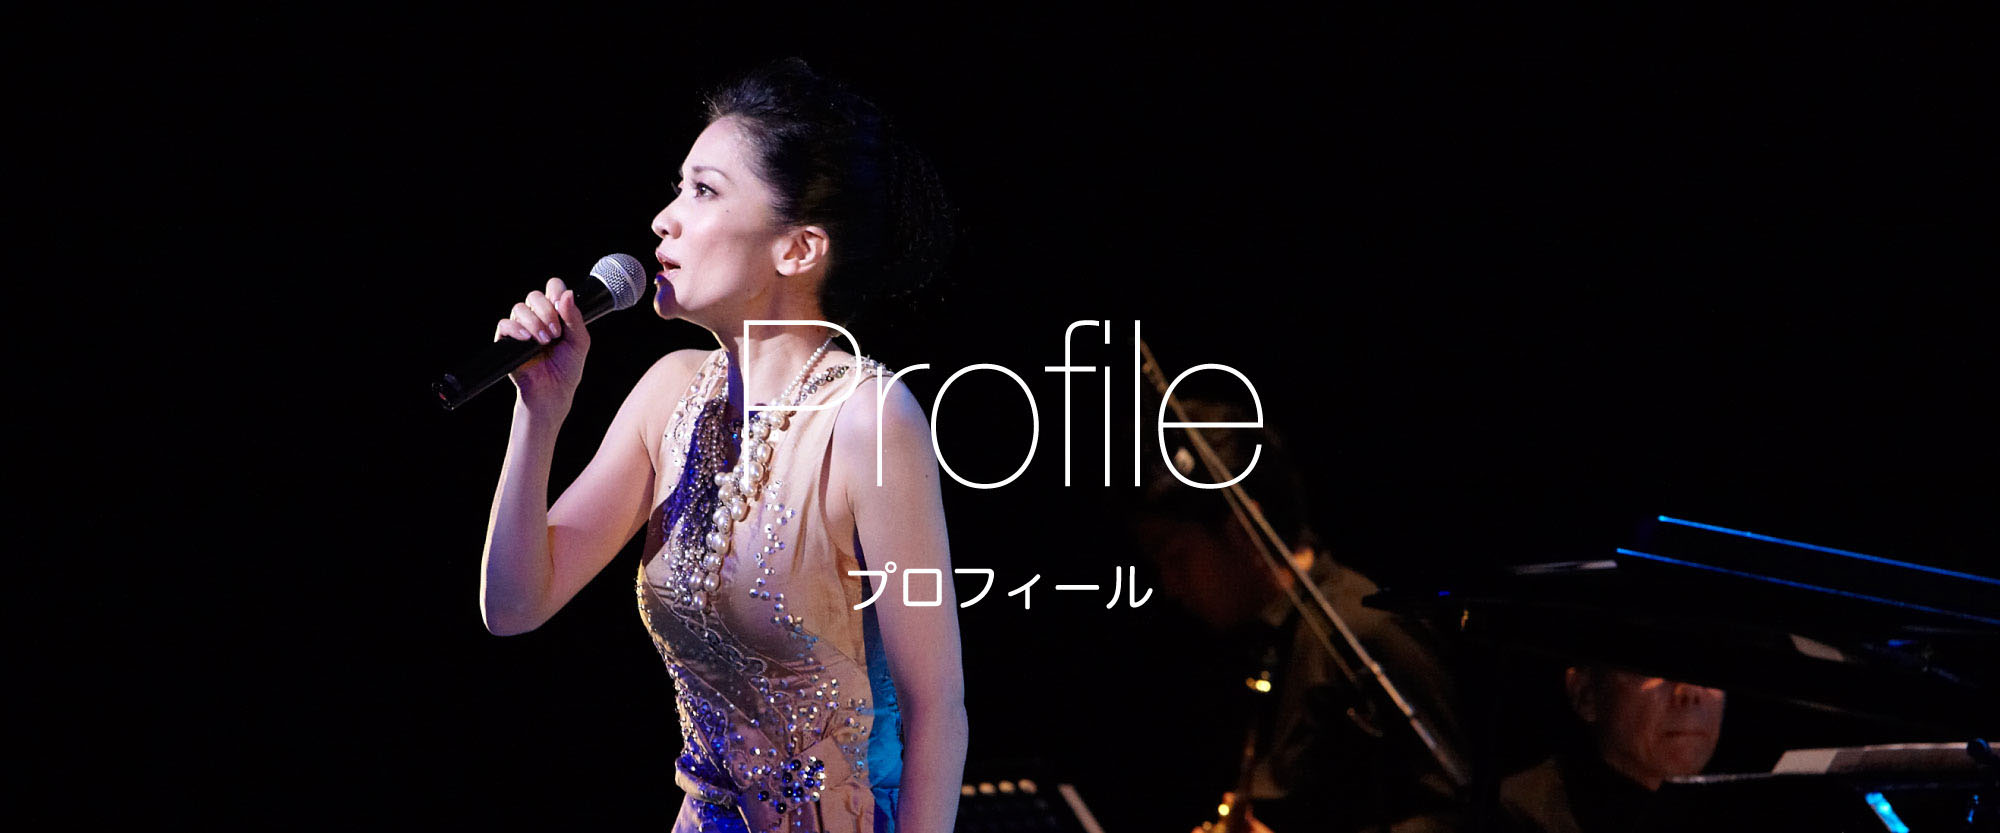 http://www.shimada-kaho.com/assets/images/profile/lead/profile.jpg